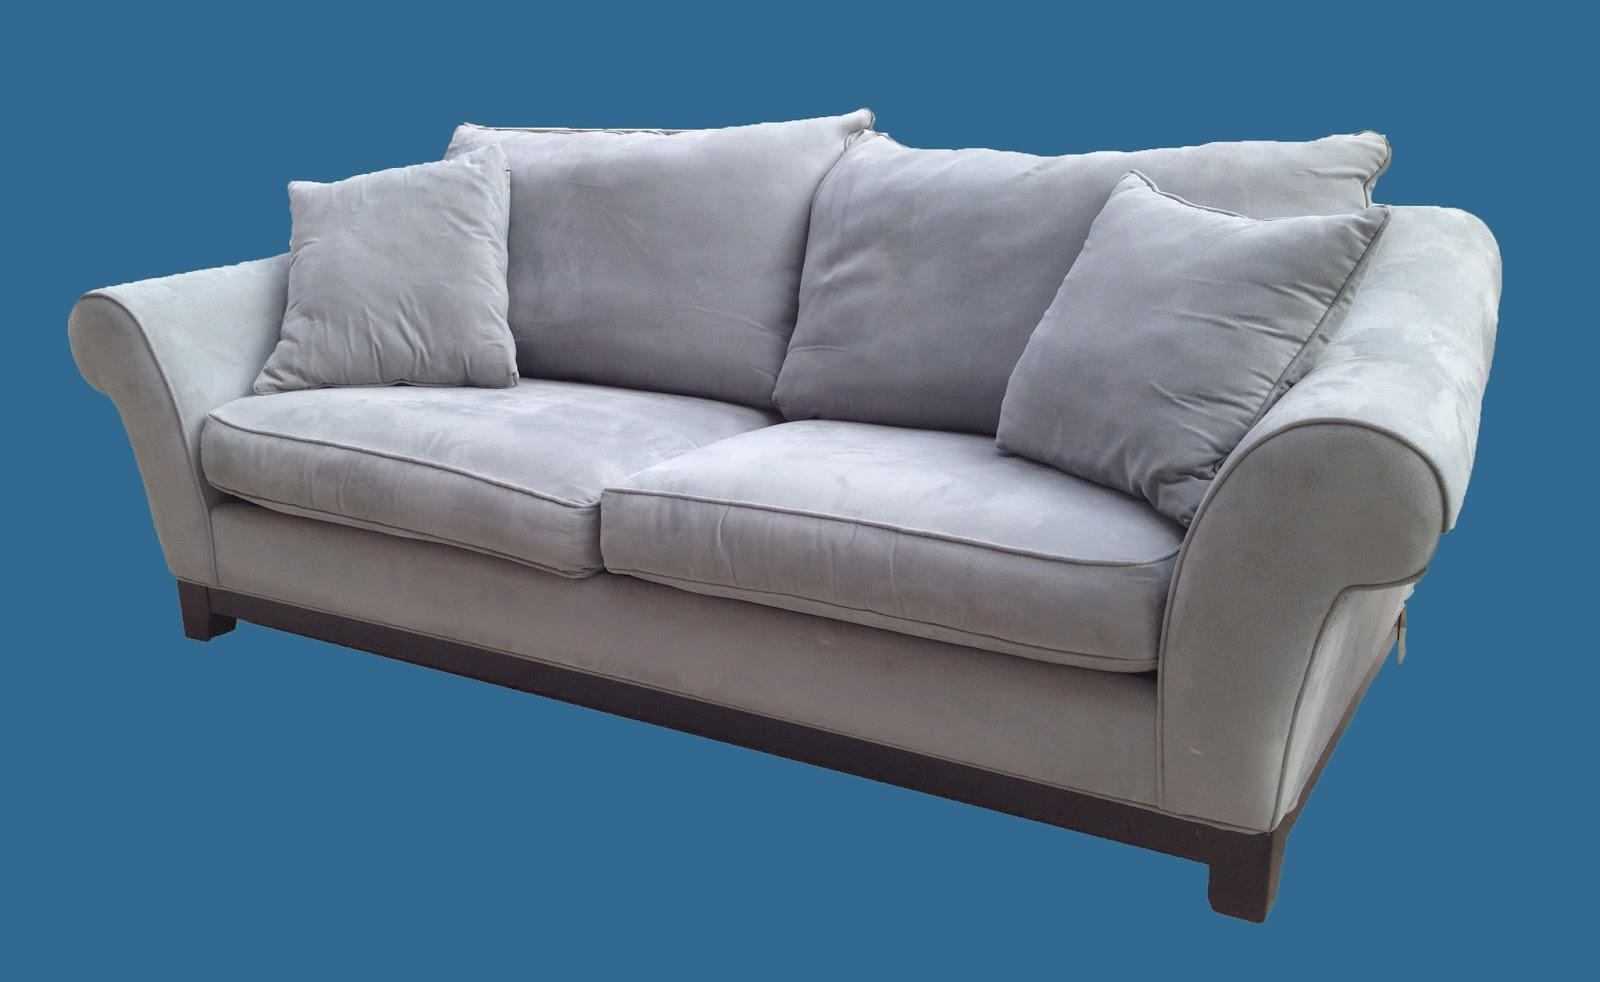 Outstanding Uhuru Furniture Collectibles Soft Blue Microfiber Sofa Machost Co Dining Chair Design Ideas Machostcouk